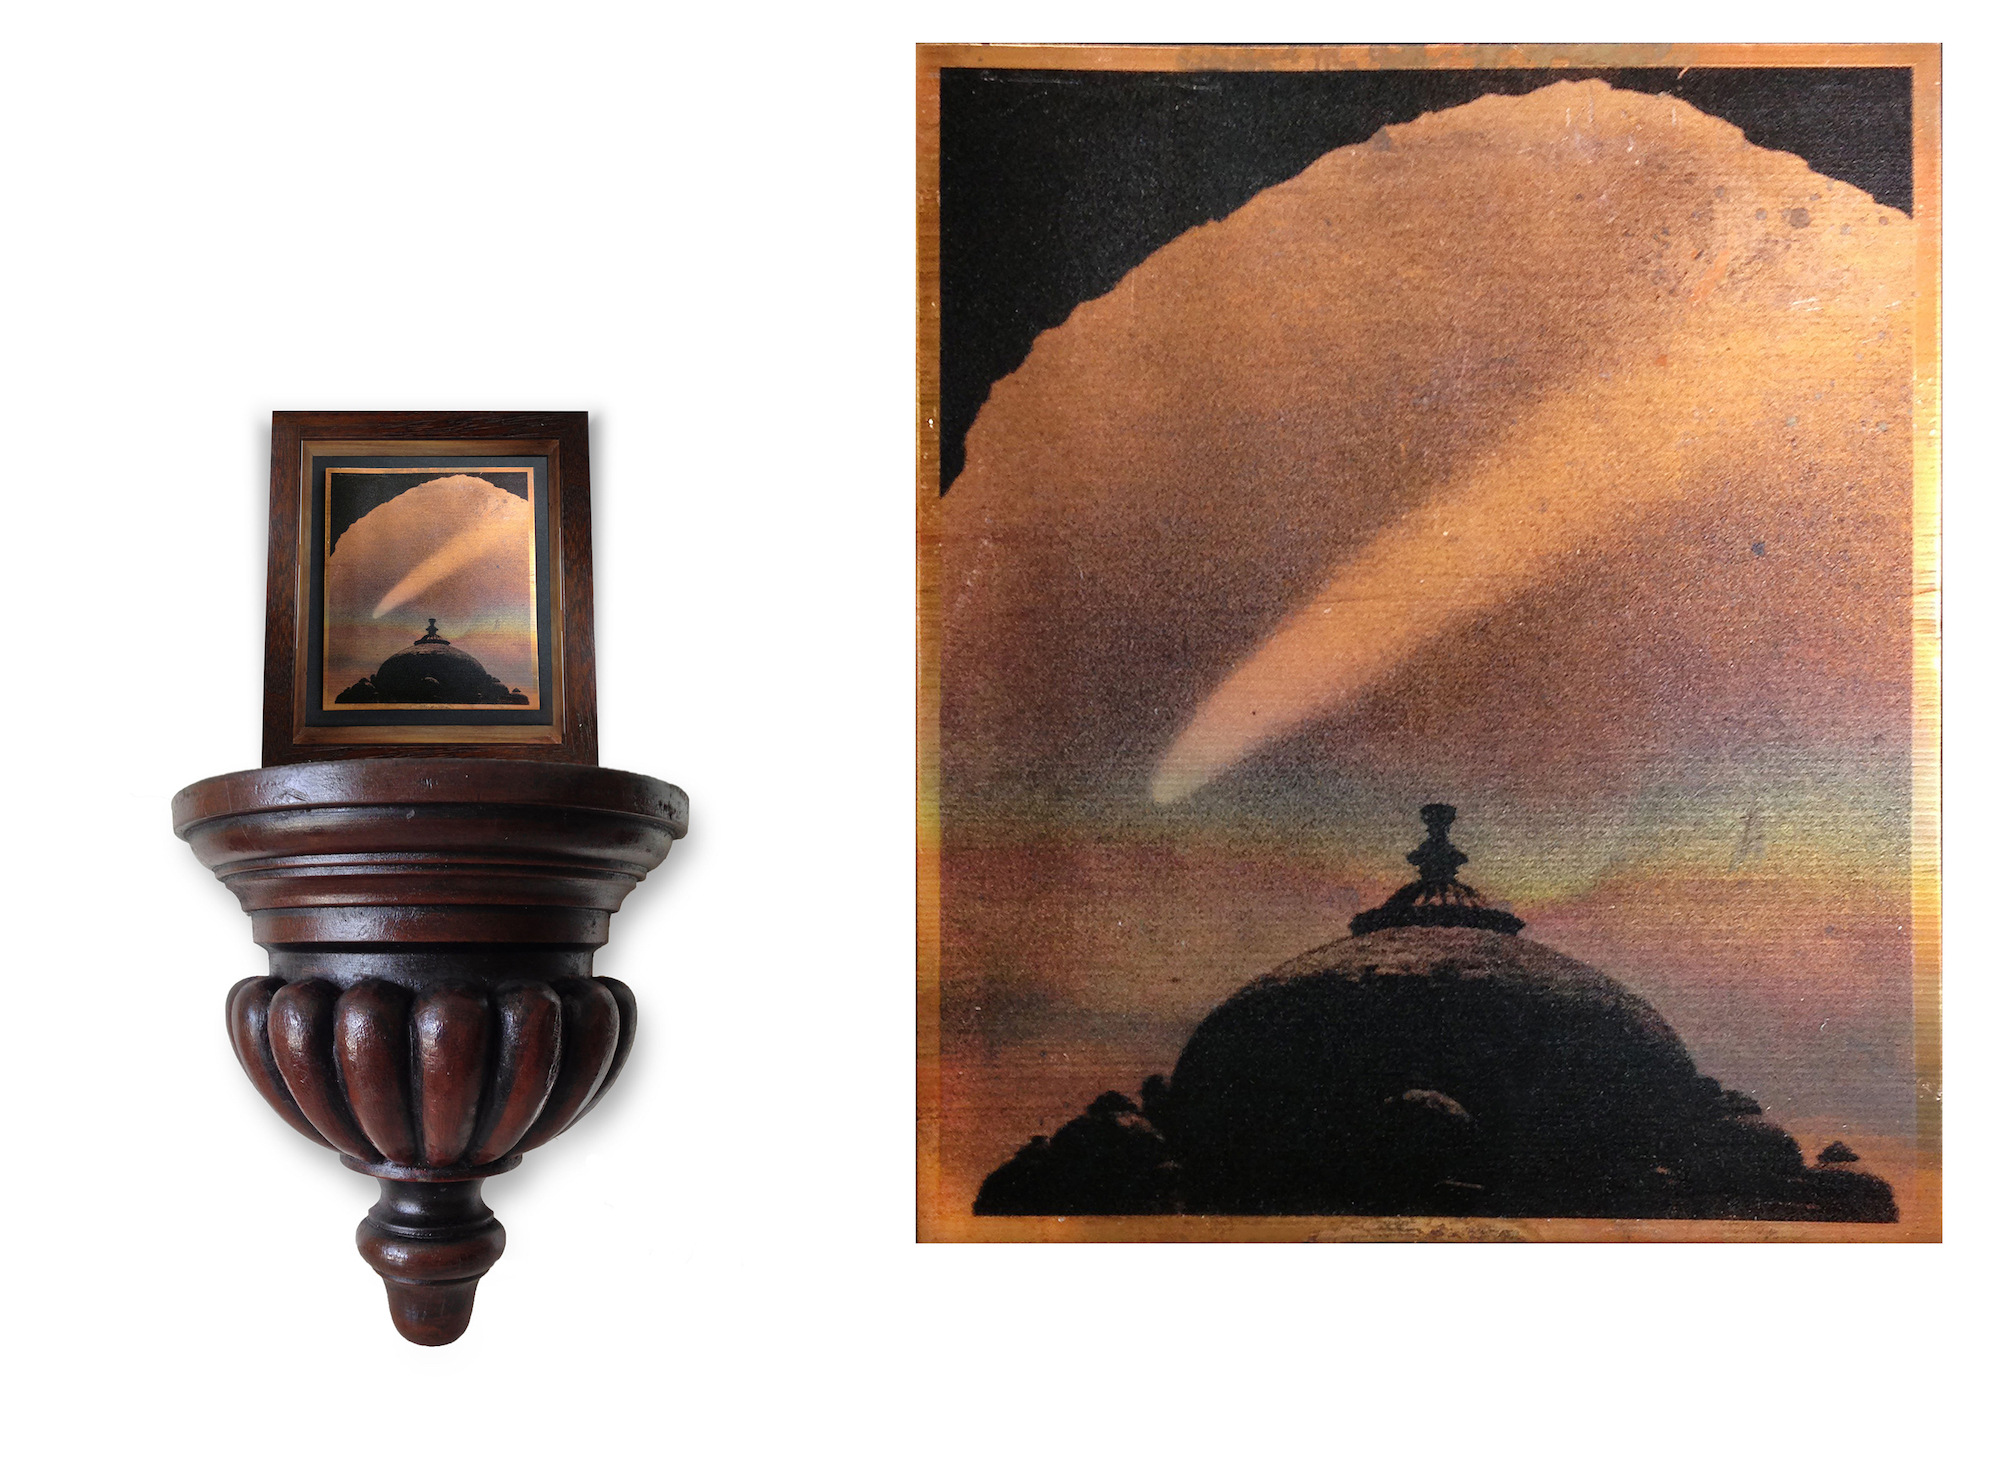 Mehreen Murtaza  Comet Bennet over Delhi, Humayun's Tomb March 1970 2013 Inkjet with primer on annealed copper sheet, 13.65 cm x 15.72 cm x 4.31 cm (framed), 11.43 x 12.7 cm (copper sheet) and 20.32 x 30.48cm (wooden Shelf) Variation 1